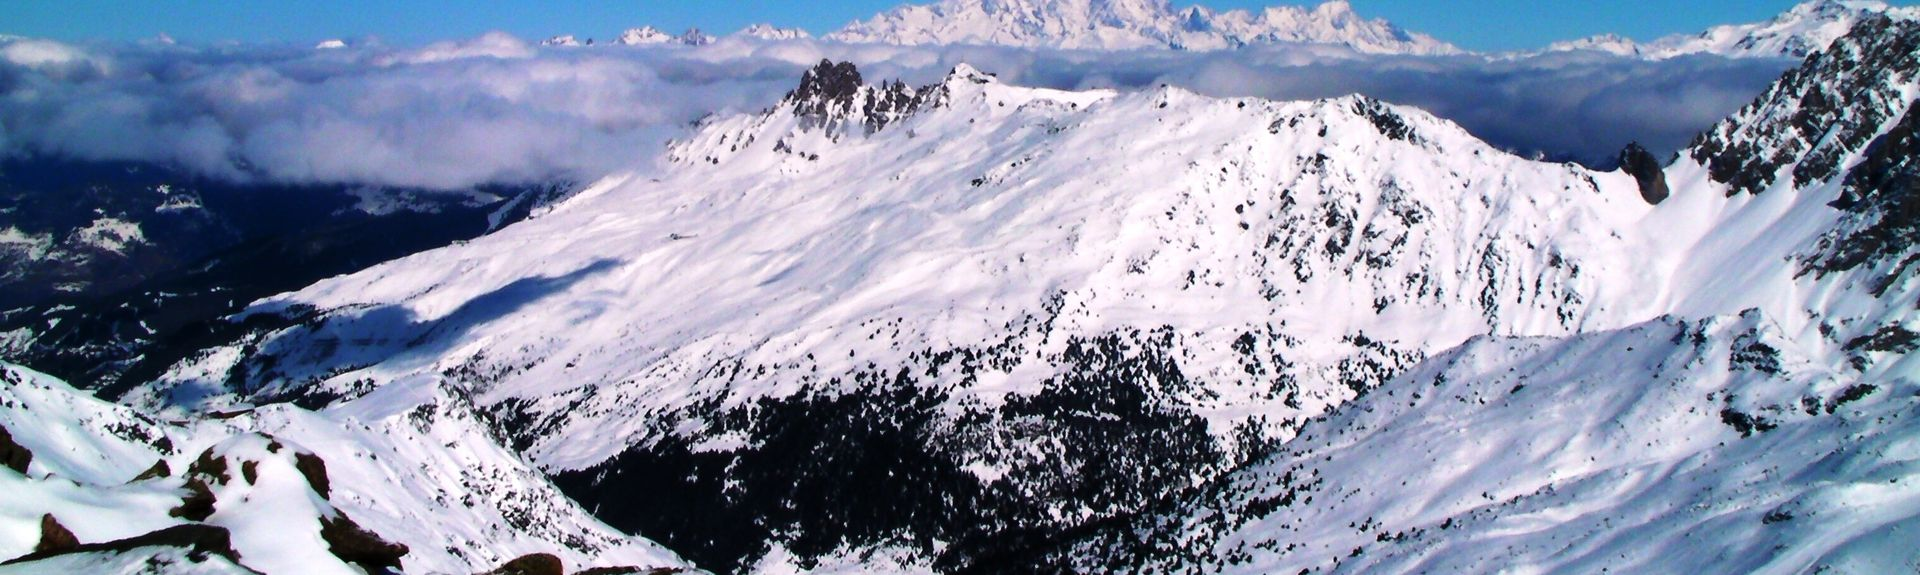 Village Ski Lift, Val-d'Isere, France